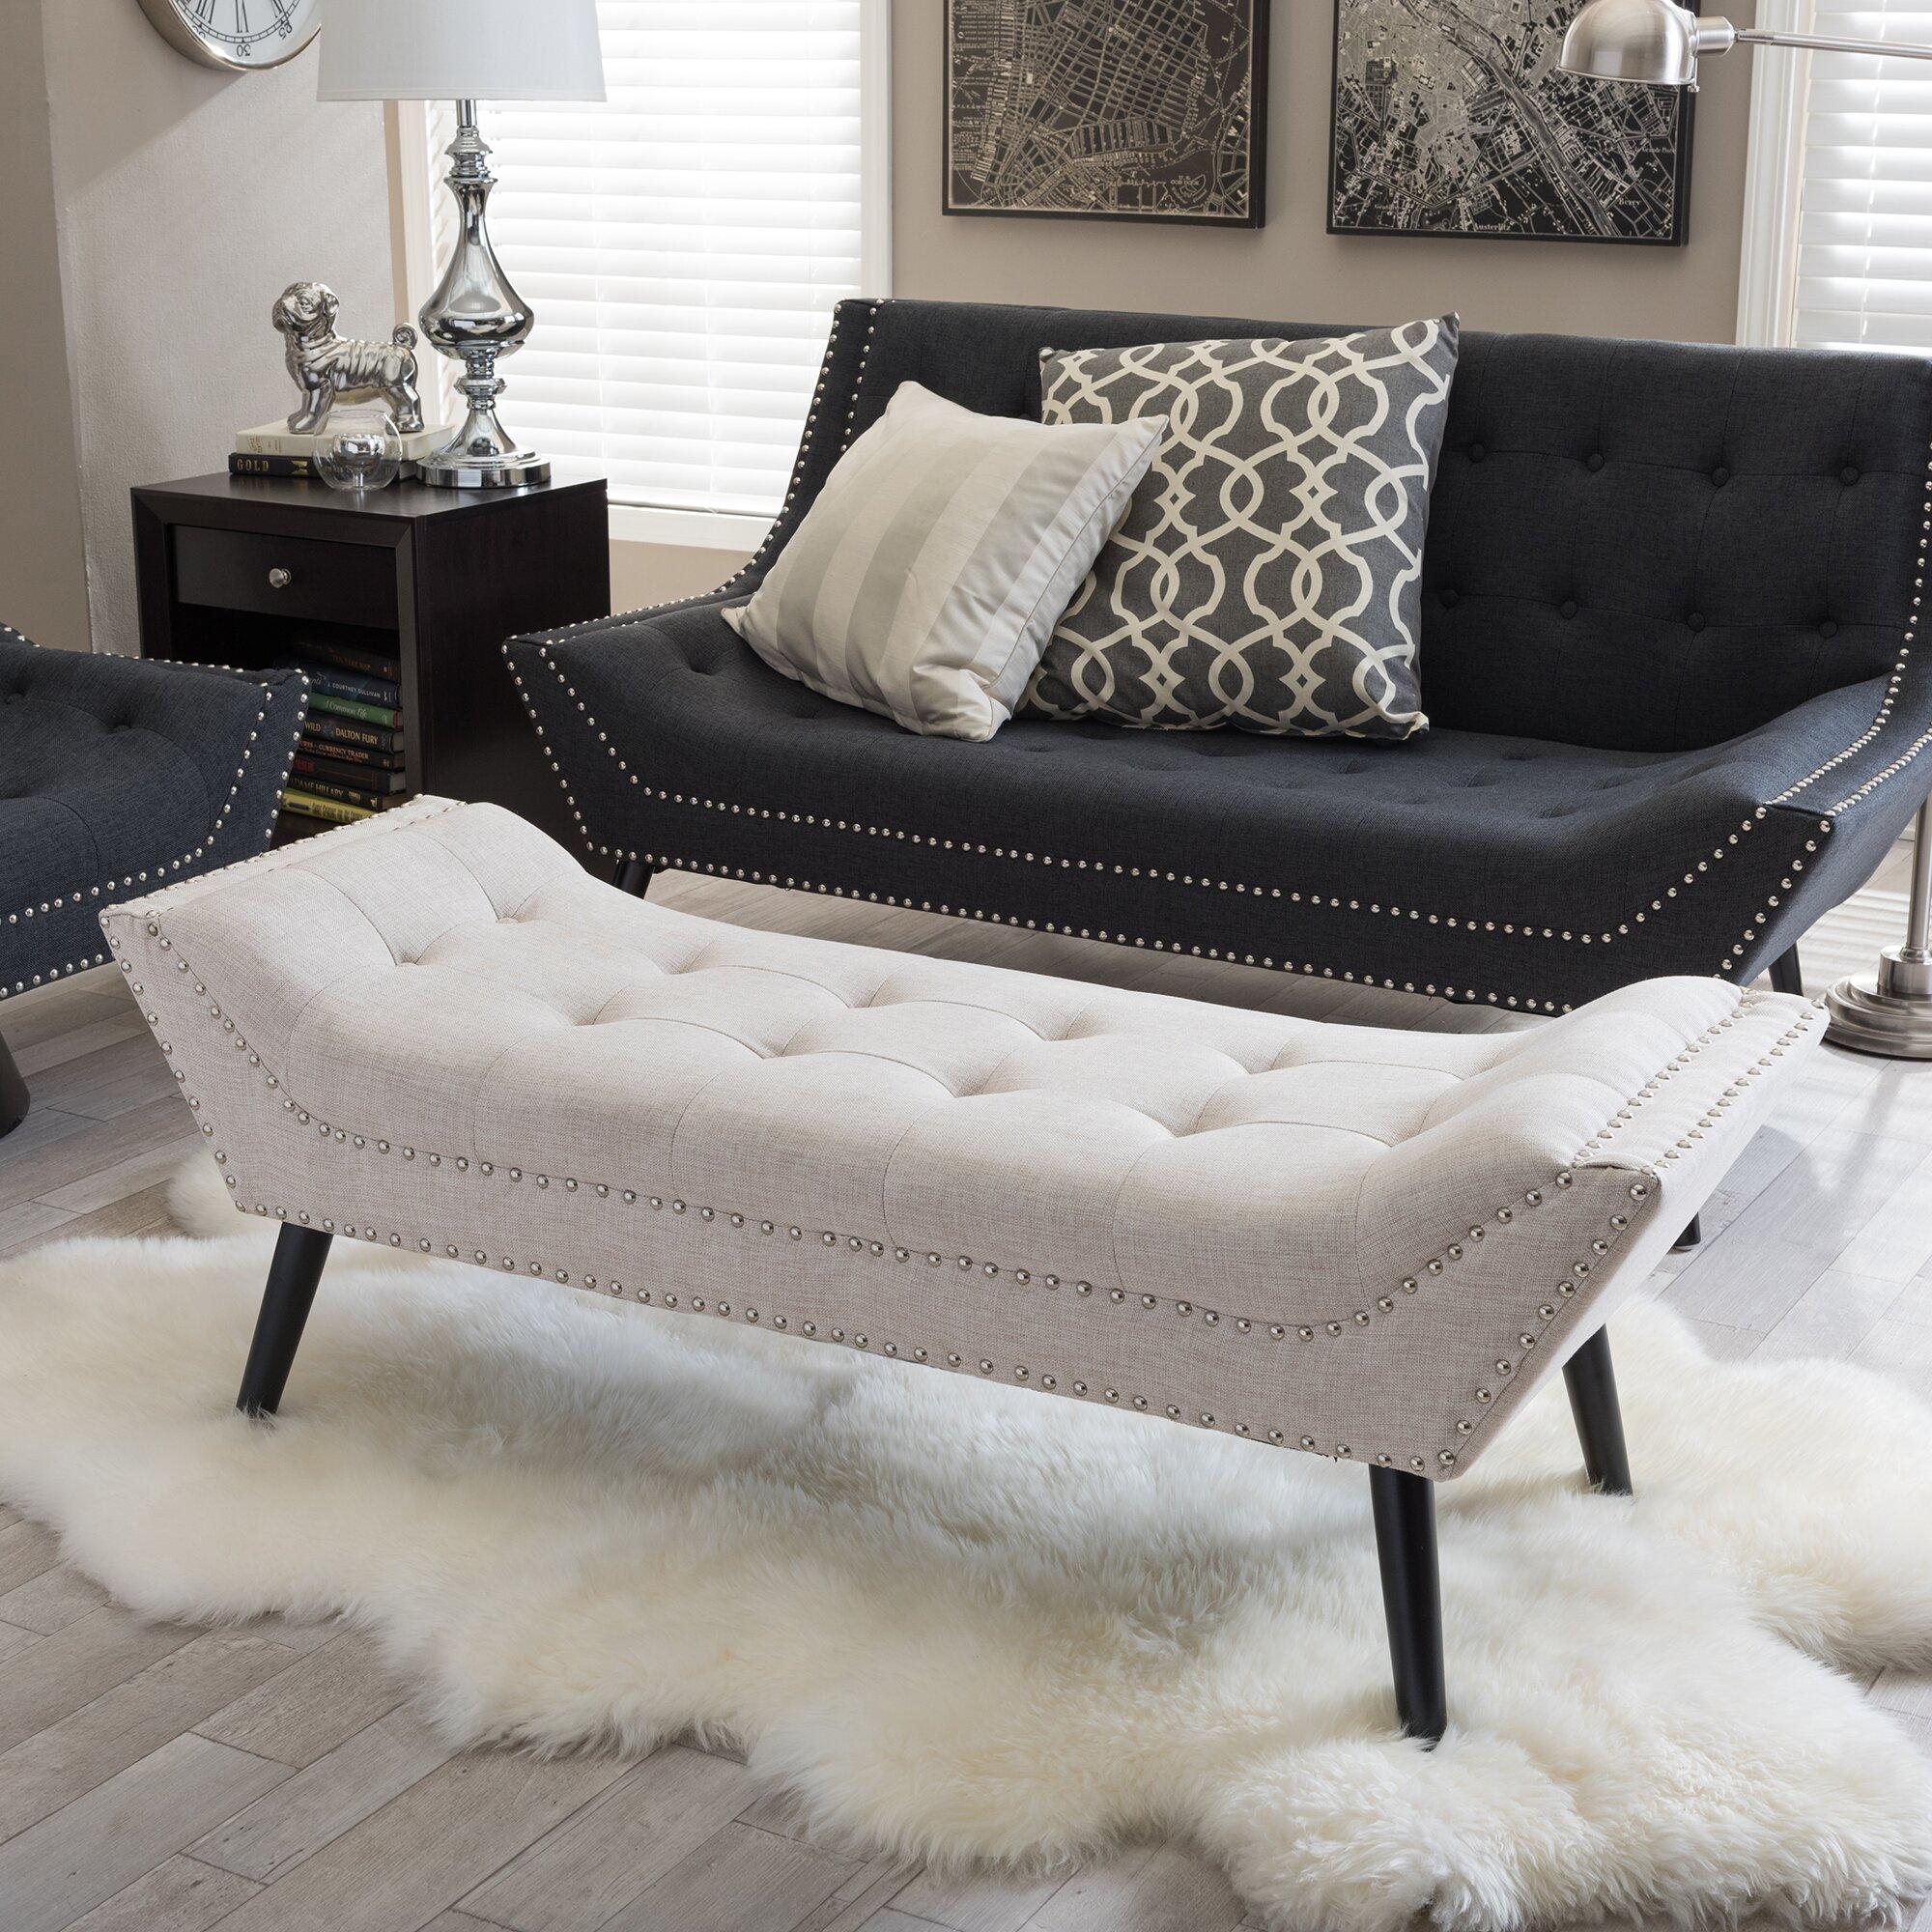 wholesale interiors baxton studio upholstered bedroom bench